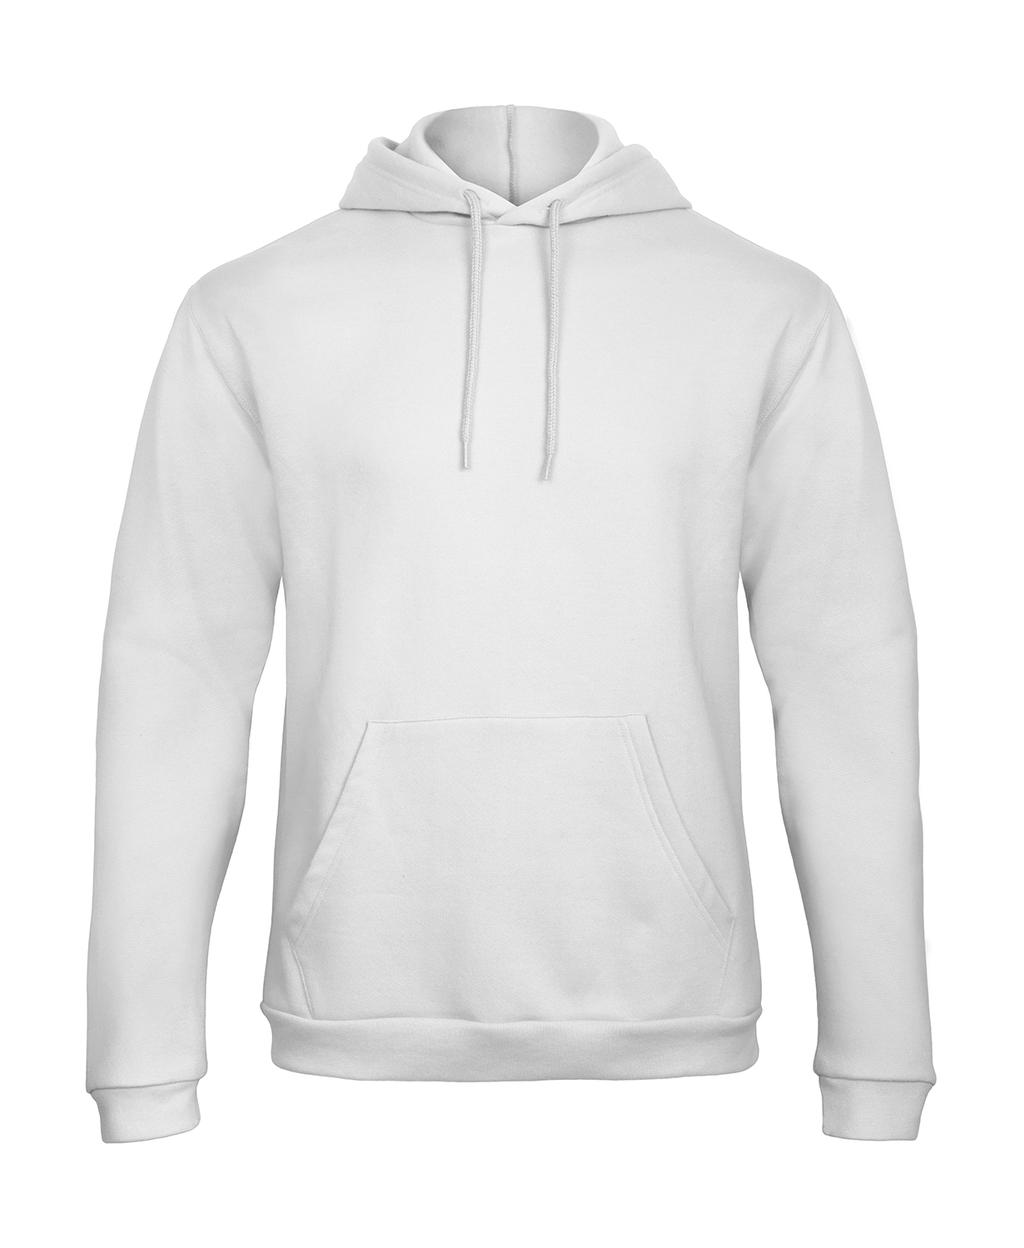 ID.203 50/50 Hooded Sweatshirt Unisex